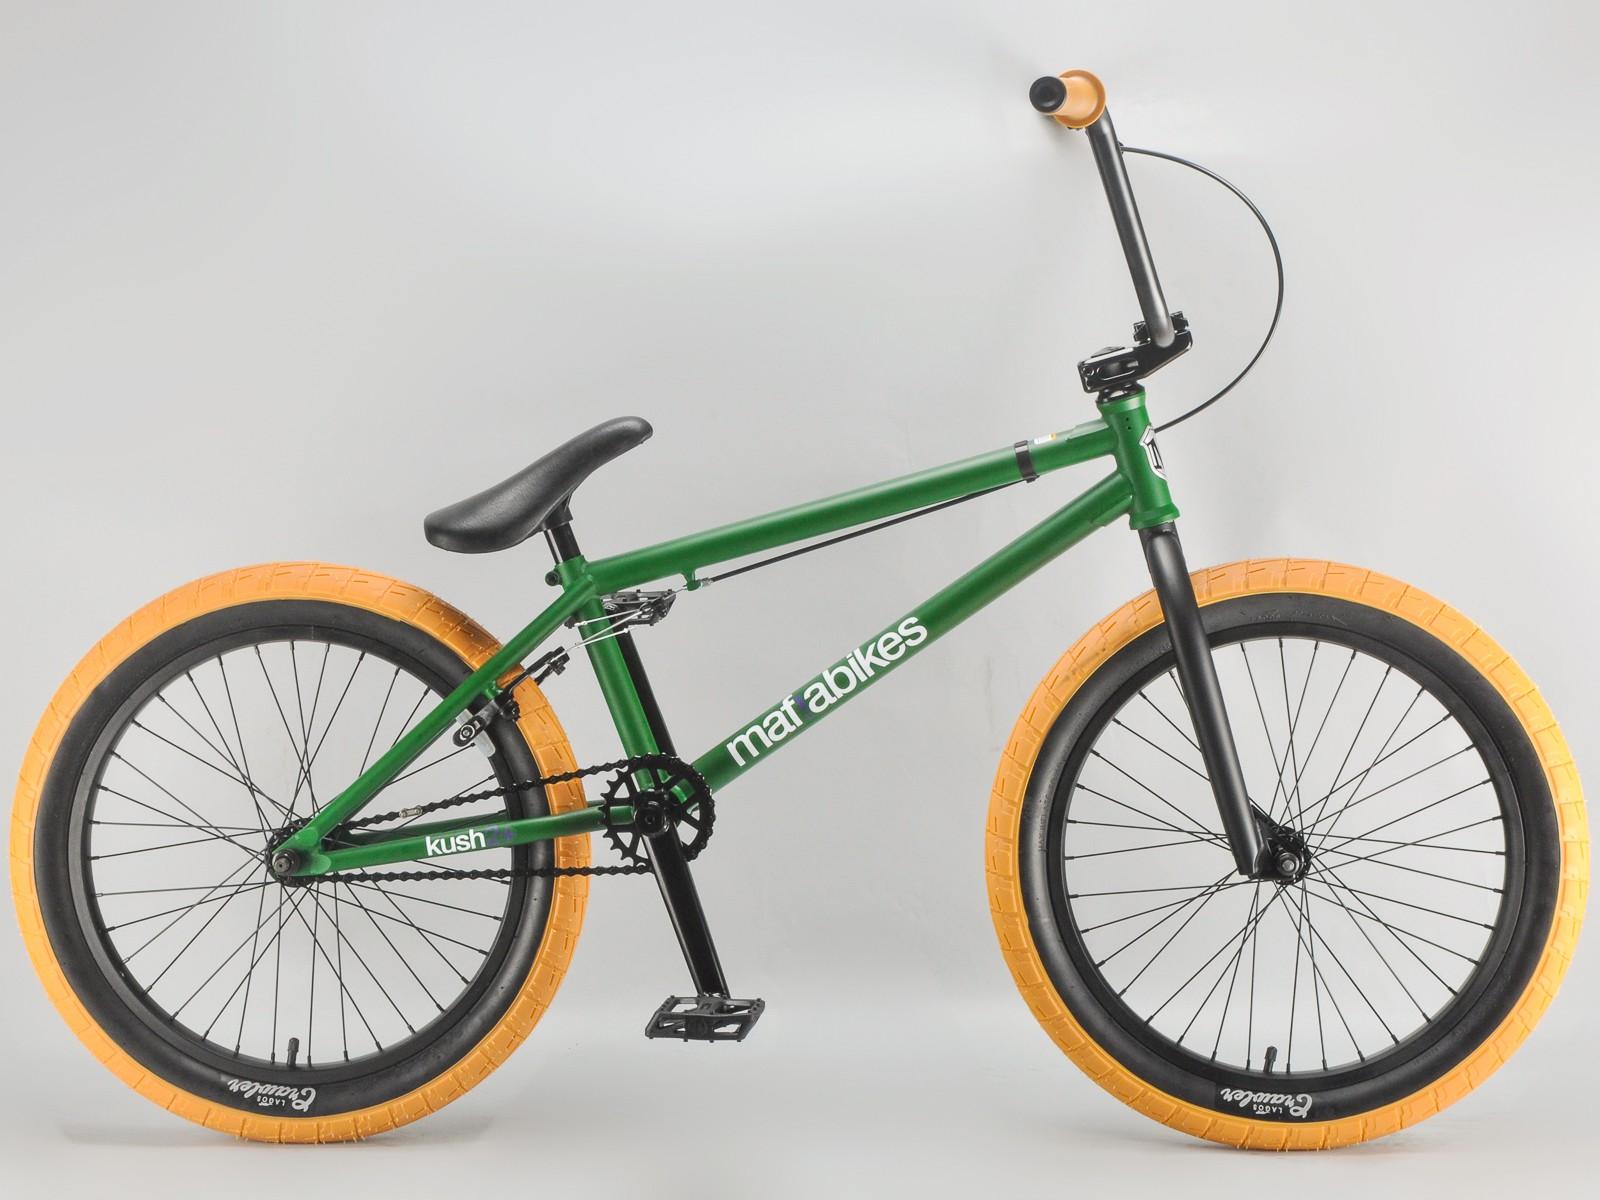 20 Zoll mafiabikes BMX Bike Kush 2+ verschiedene Farbvarianten | eBay